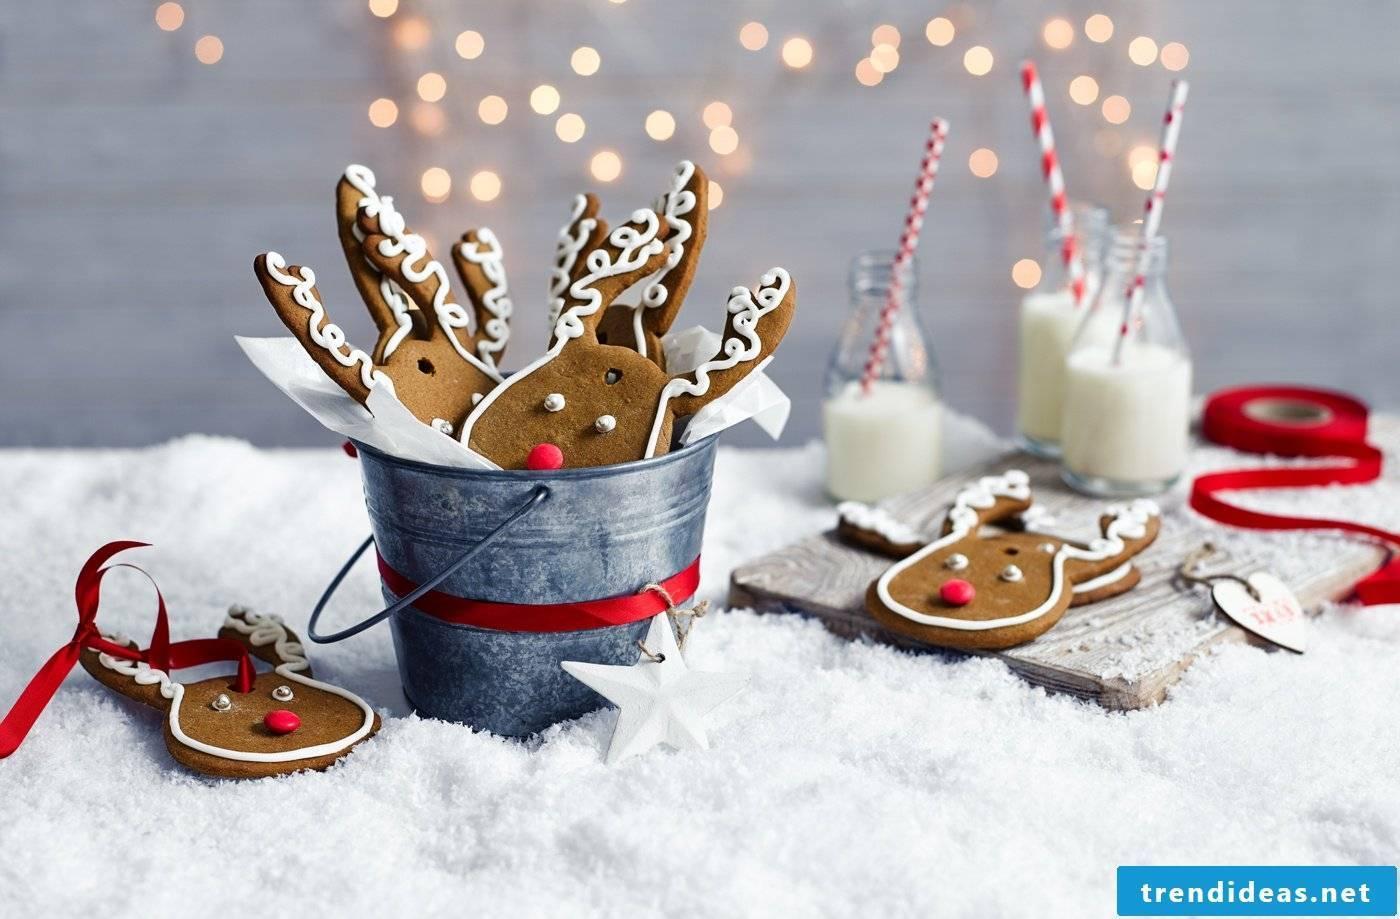 Gift for girlfriend - baking christmas cookies